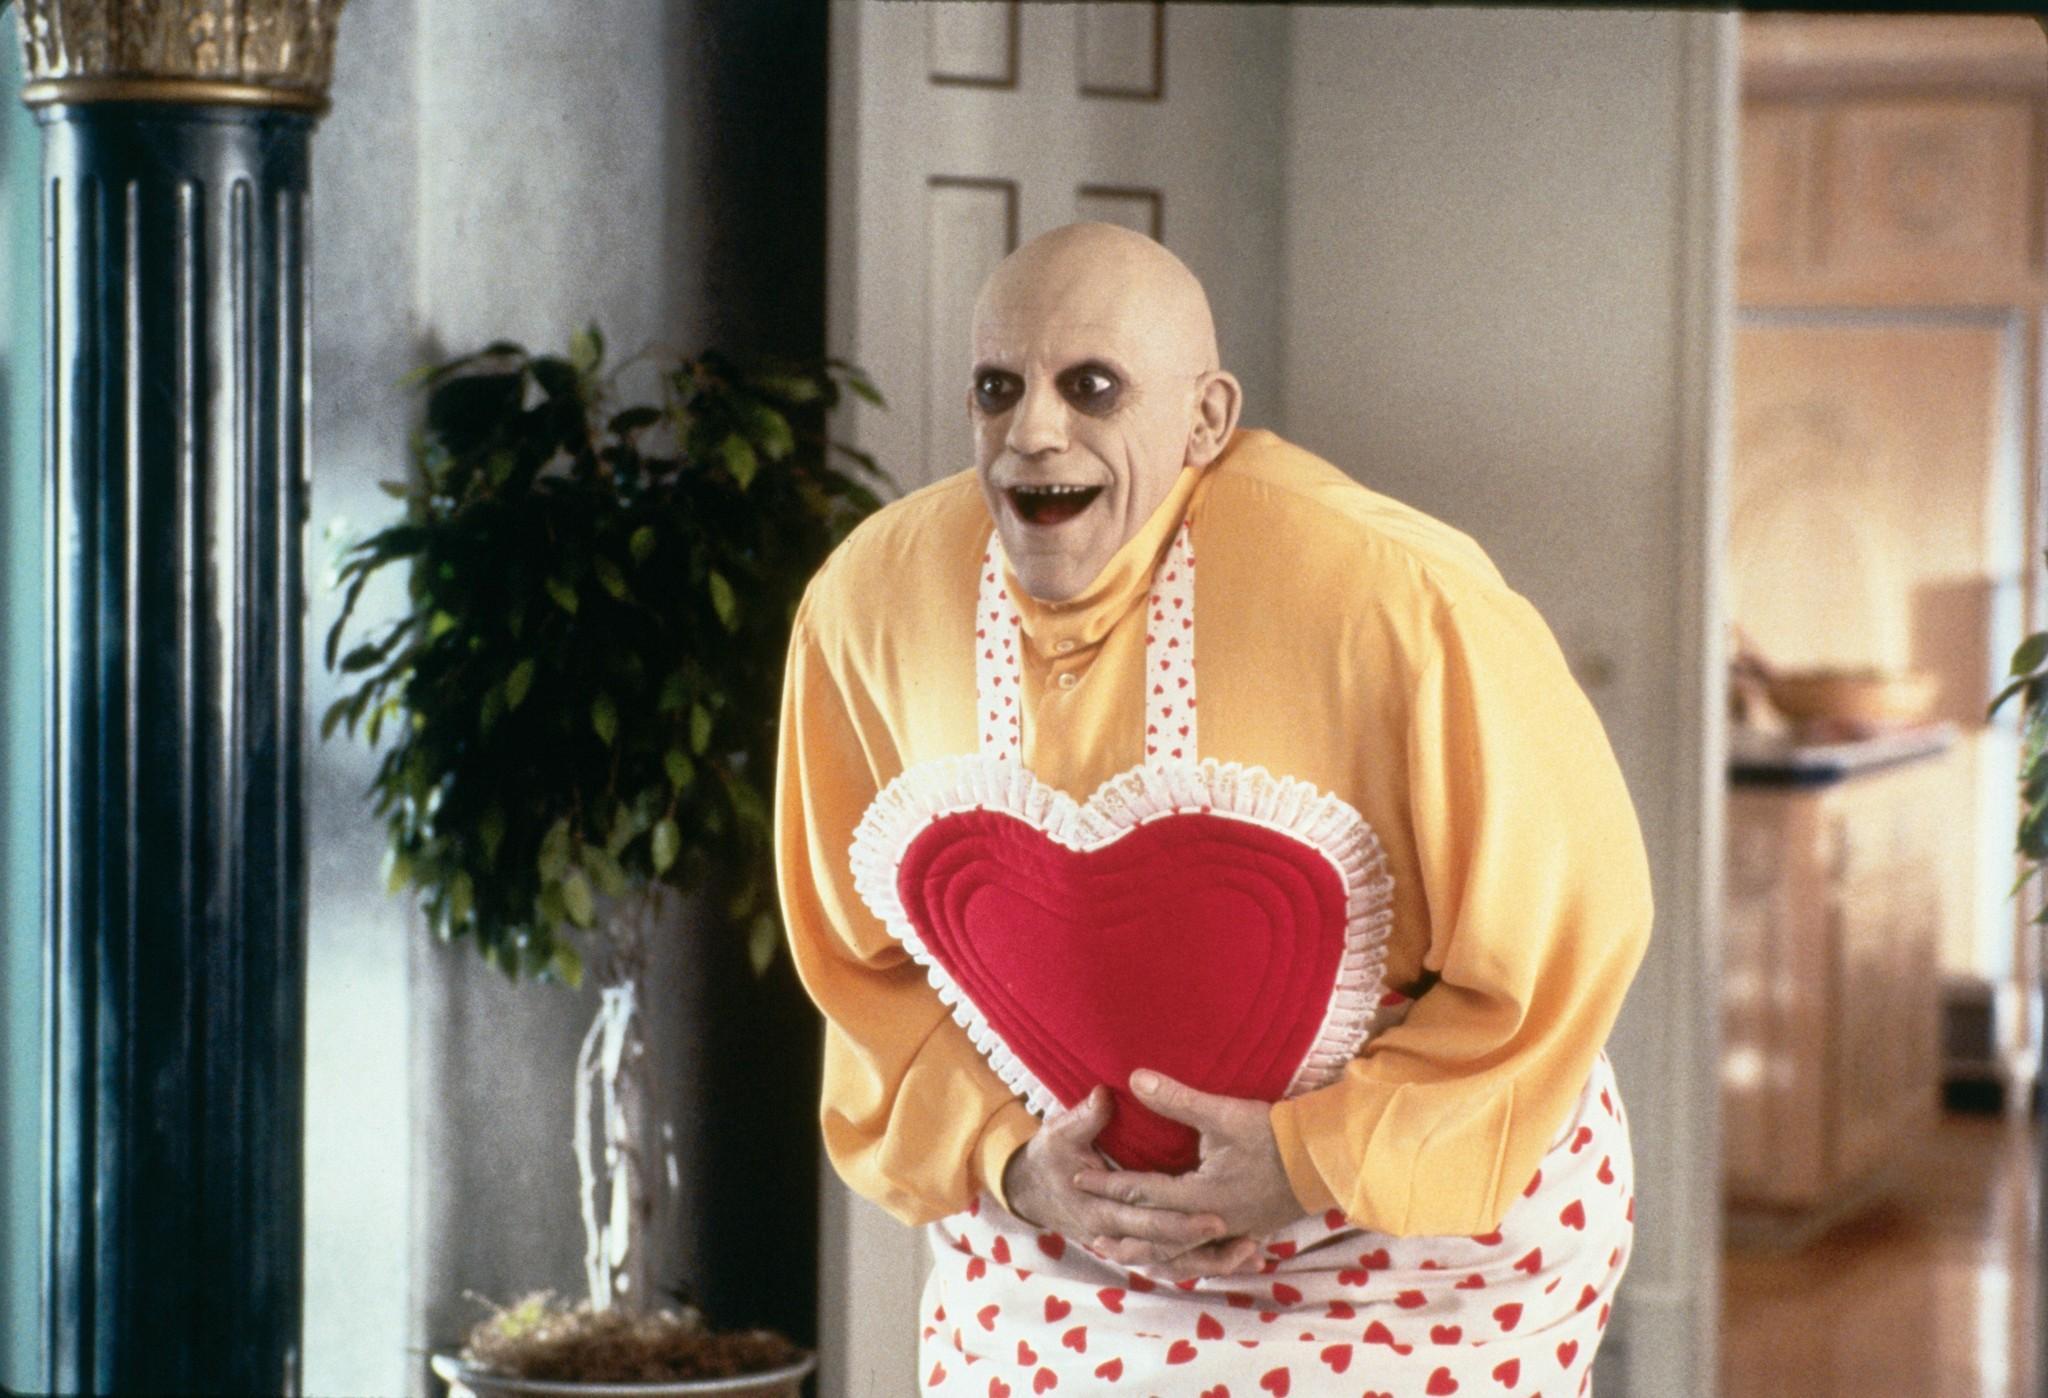 Addams family 2. - Egy kicsivel galádabb család / The Addams Family Values (1993)